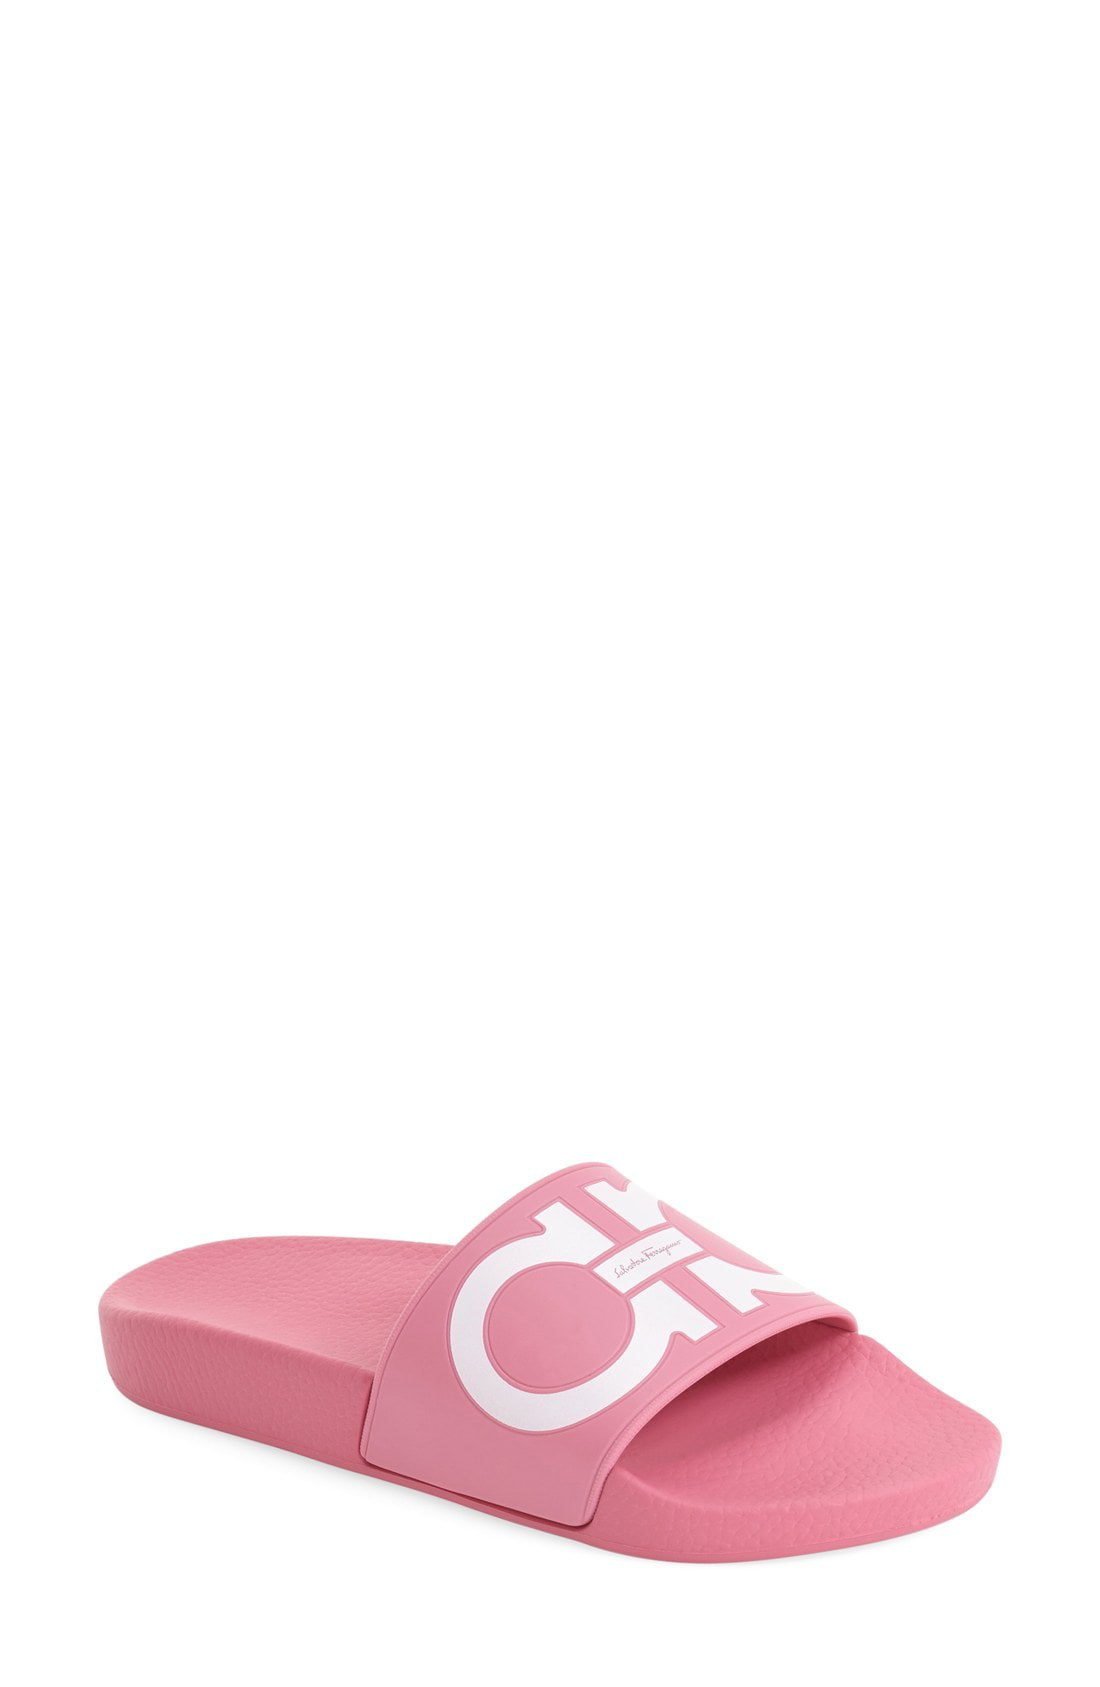 114894f559d8 Salvatore Ferragamo Groove Gancini Flat Slide Sandals